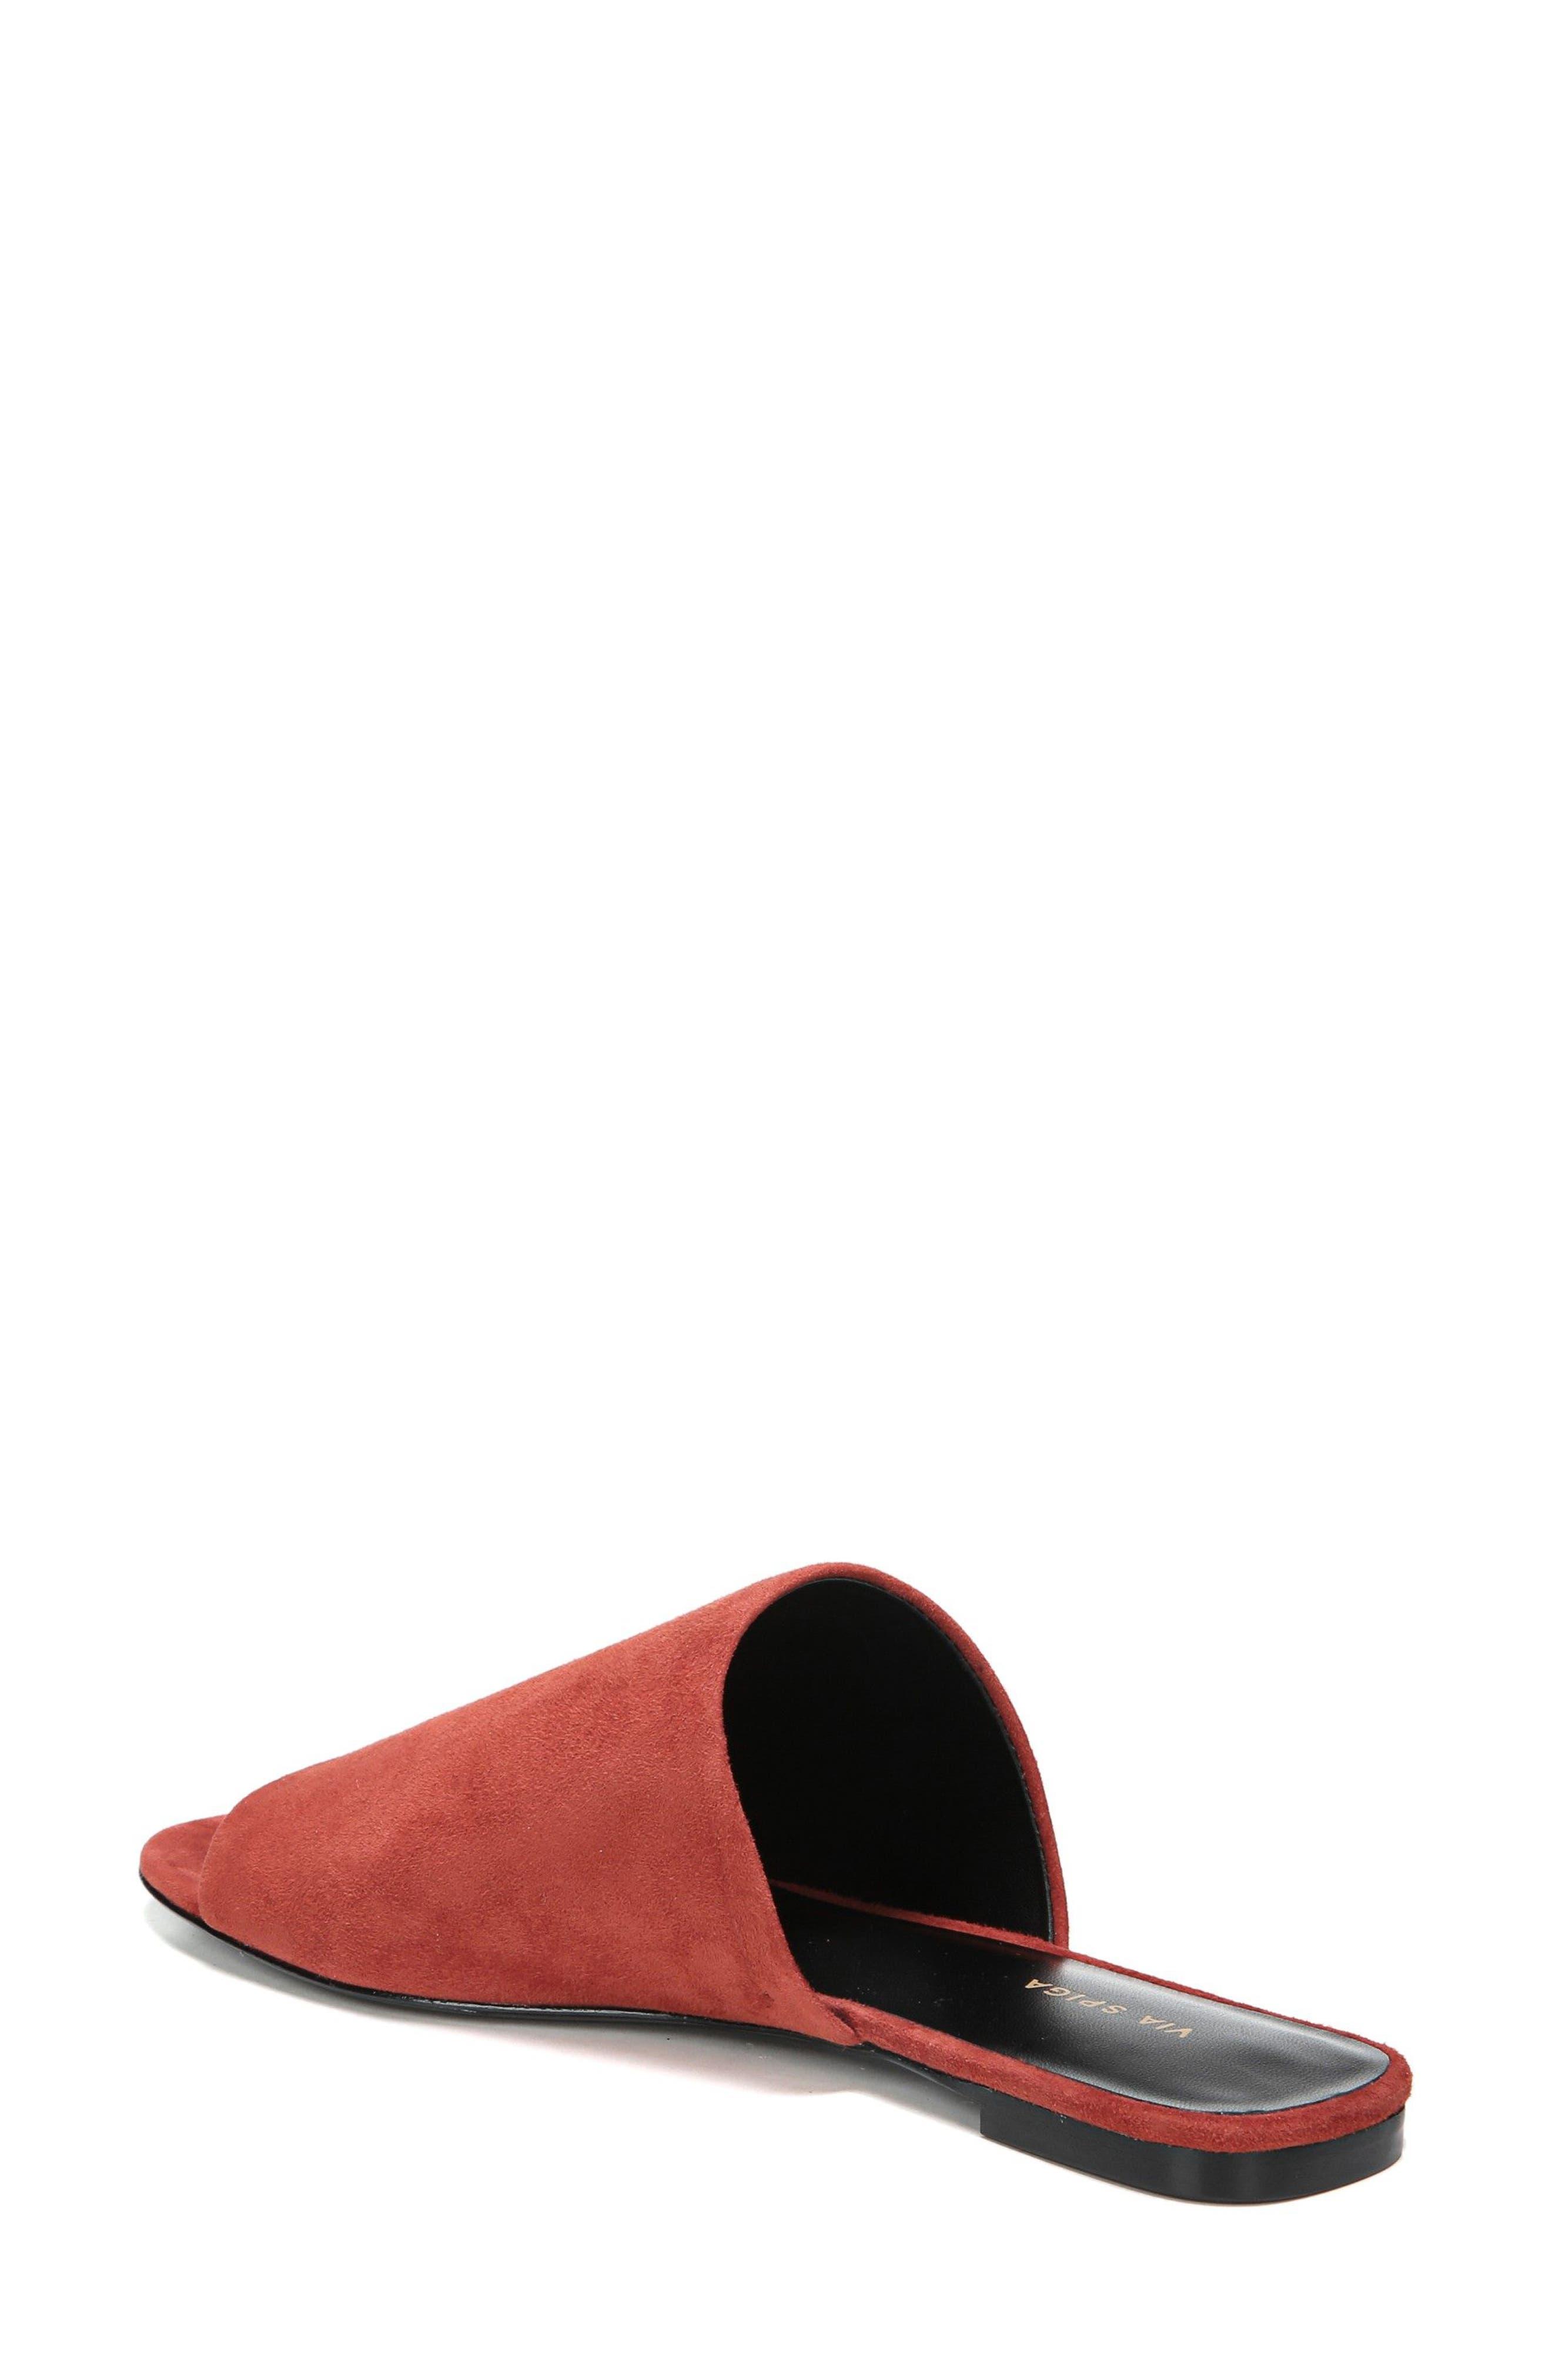 Heather Slide Sandal,                             Alternate thumbnail 2, color,                             Brick Leather